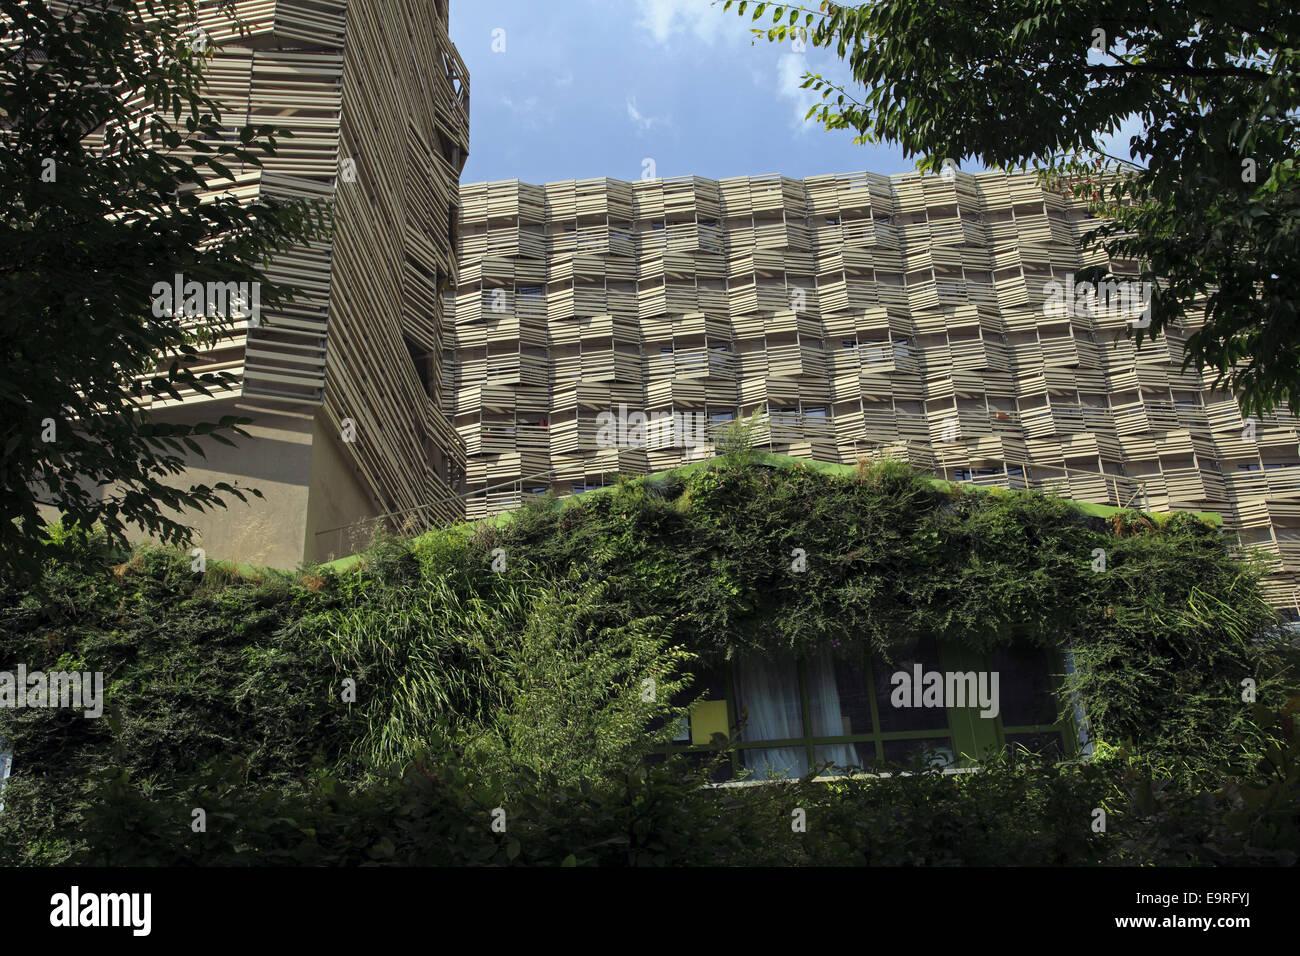 Eco-neighborhood labeled New Urban Area, Clichy-Batignolles, Paris, France Stock Photo